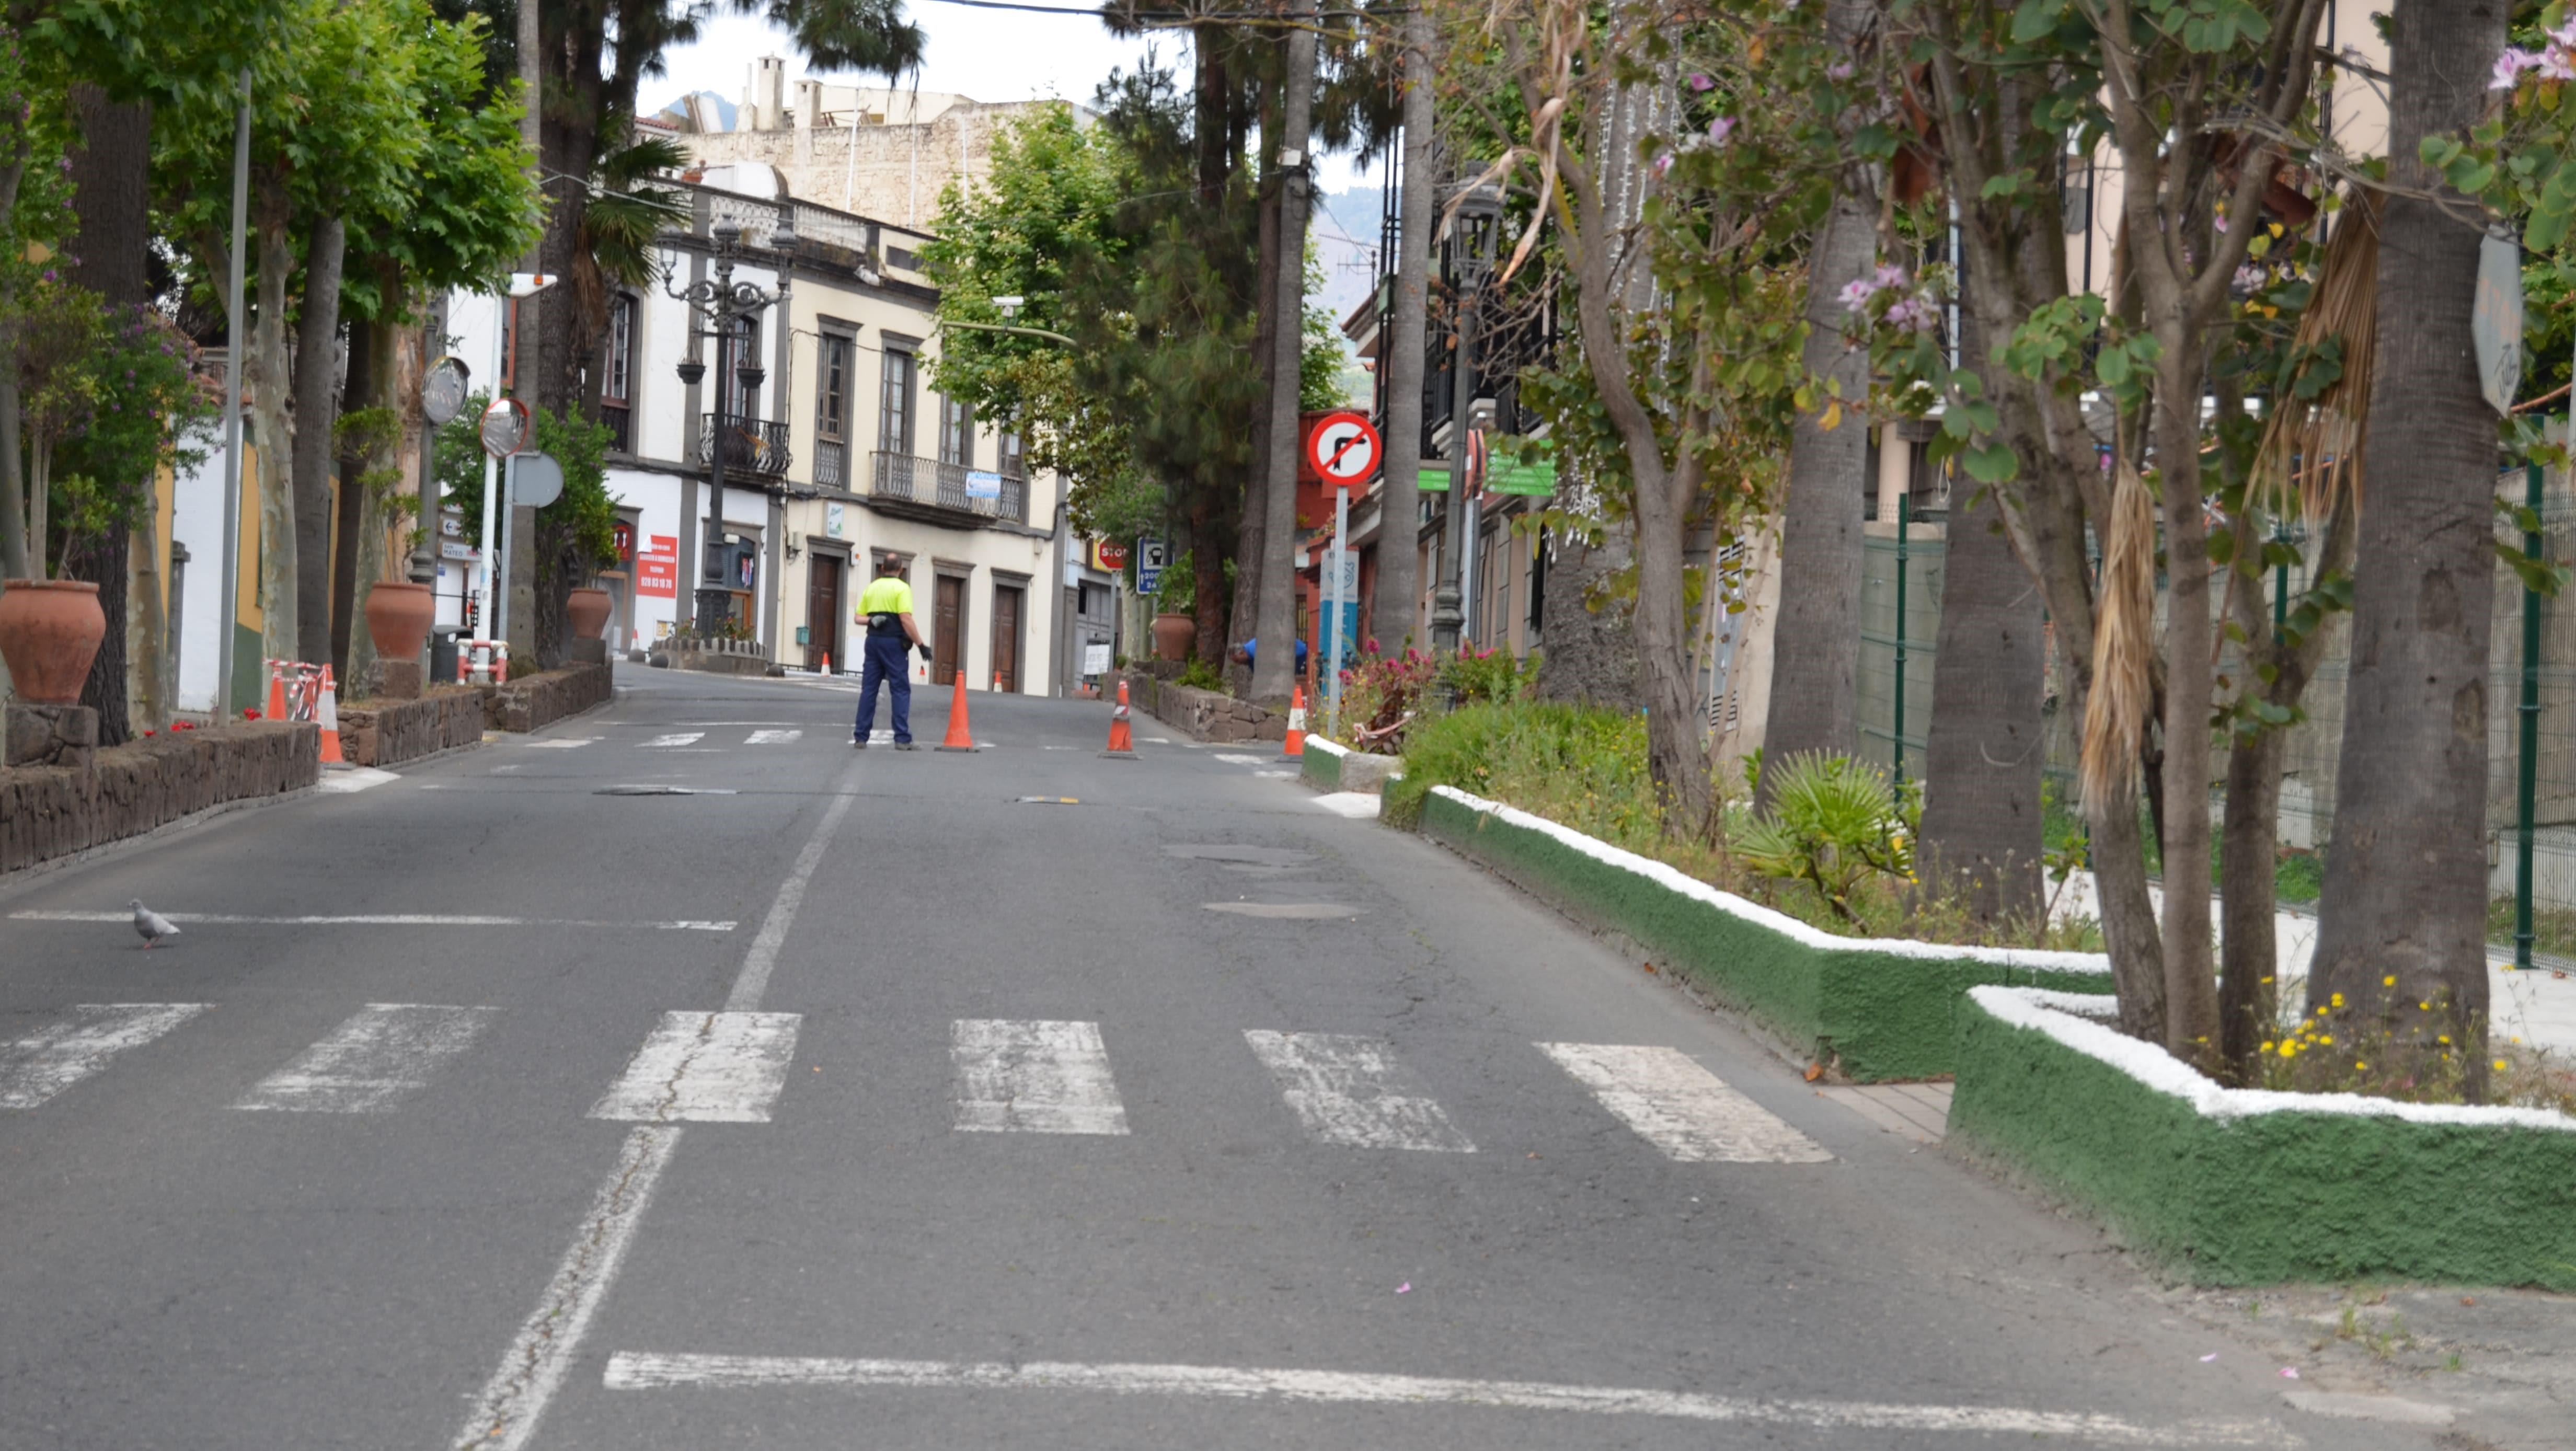 Paseo del Guiniguada Santa Brígida